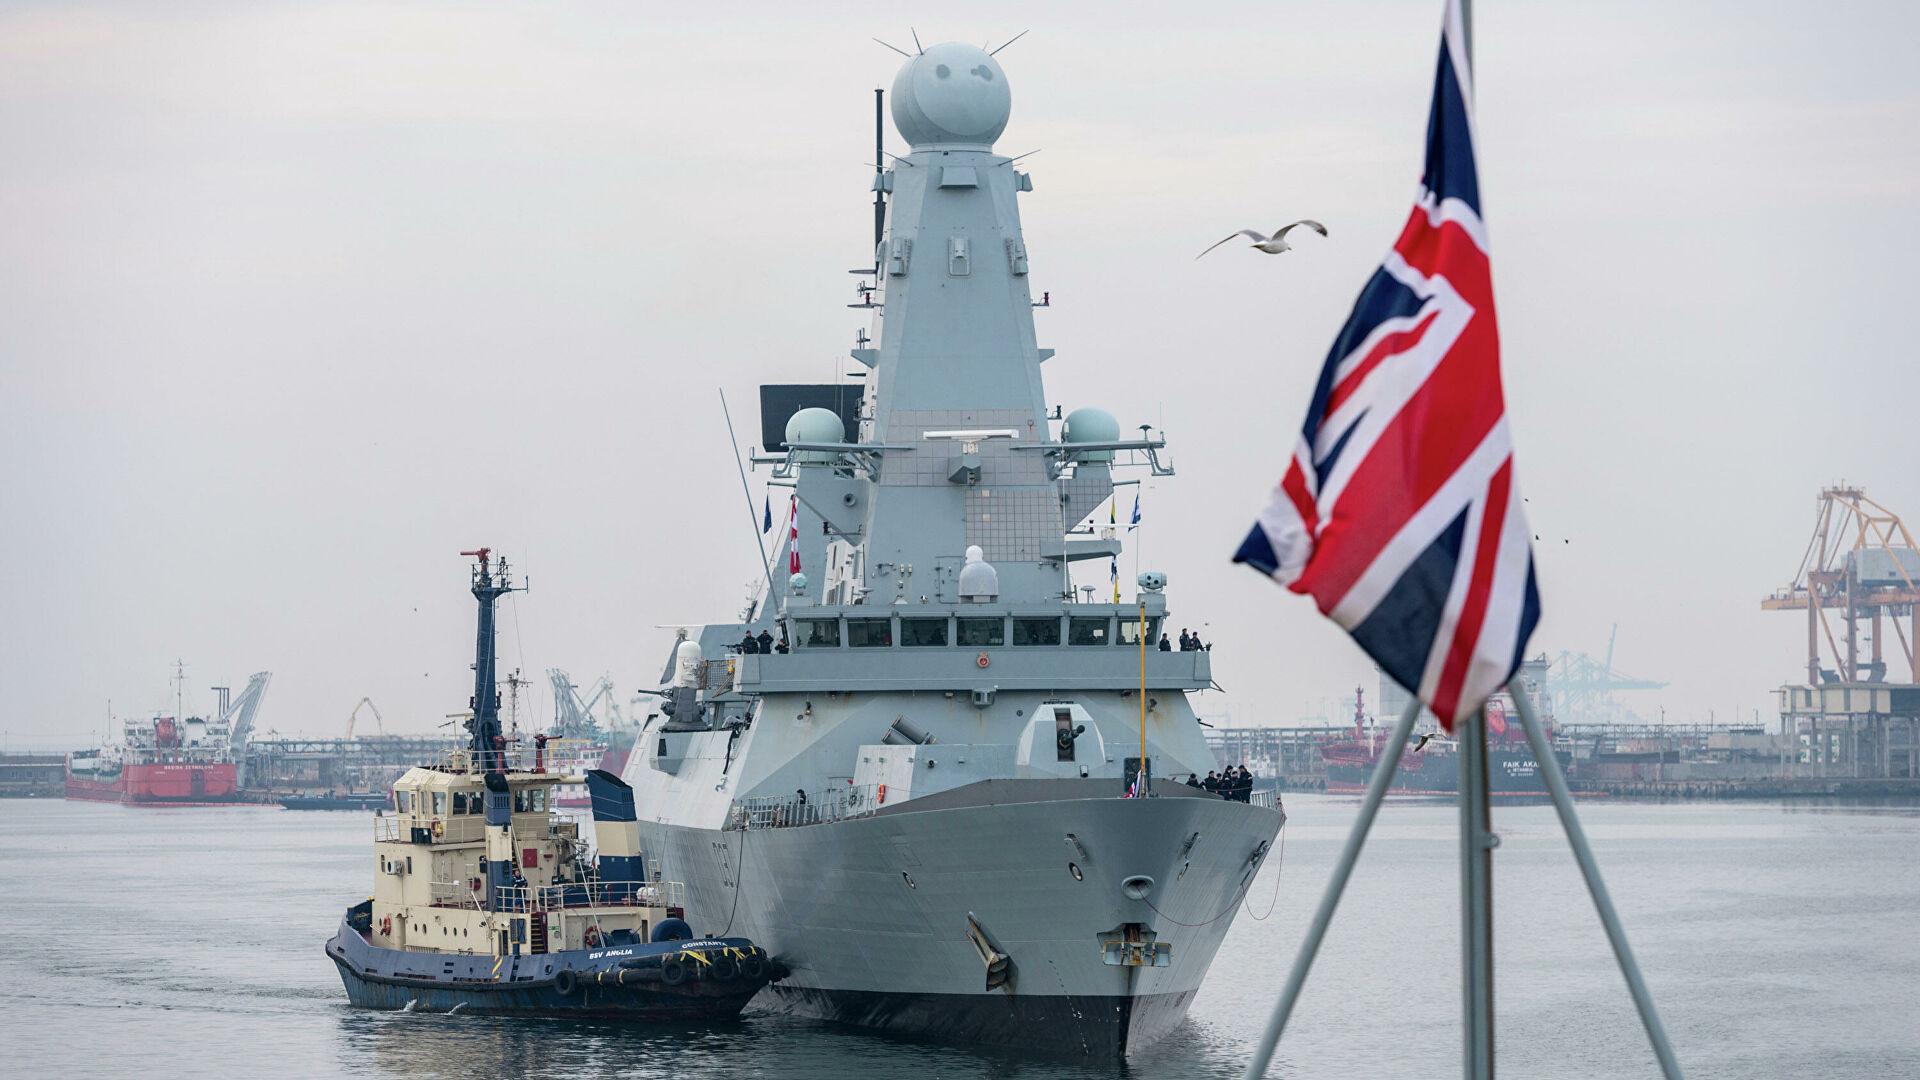 Načelnik britanskog generalštaba: Rusija predstavlja ozbiljnu pretnju